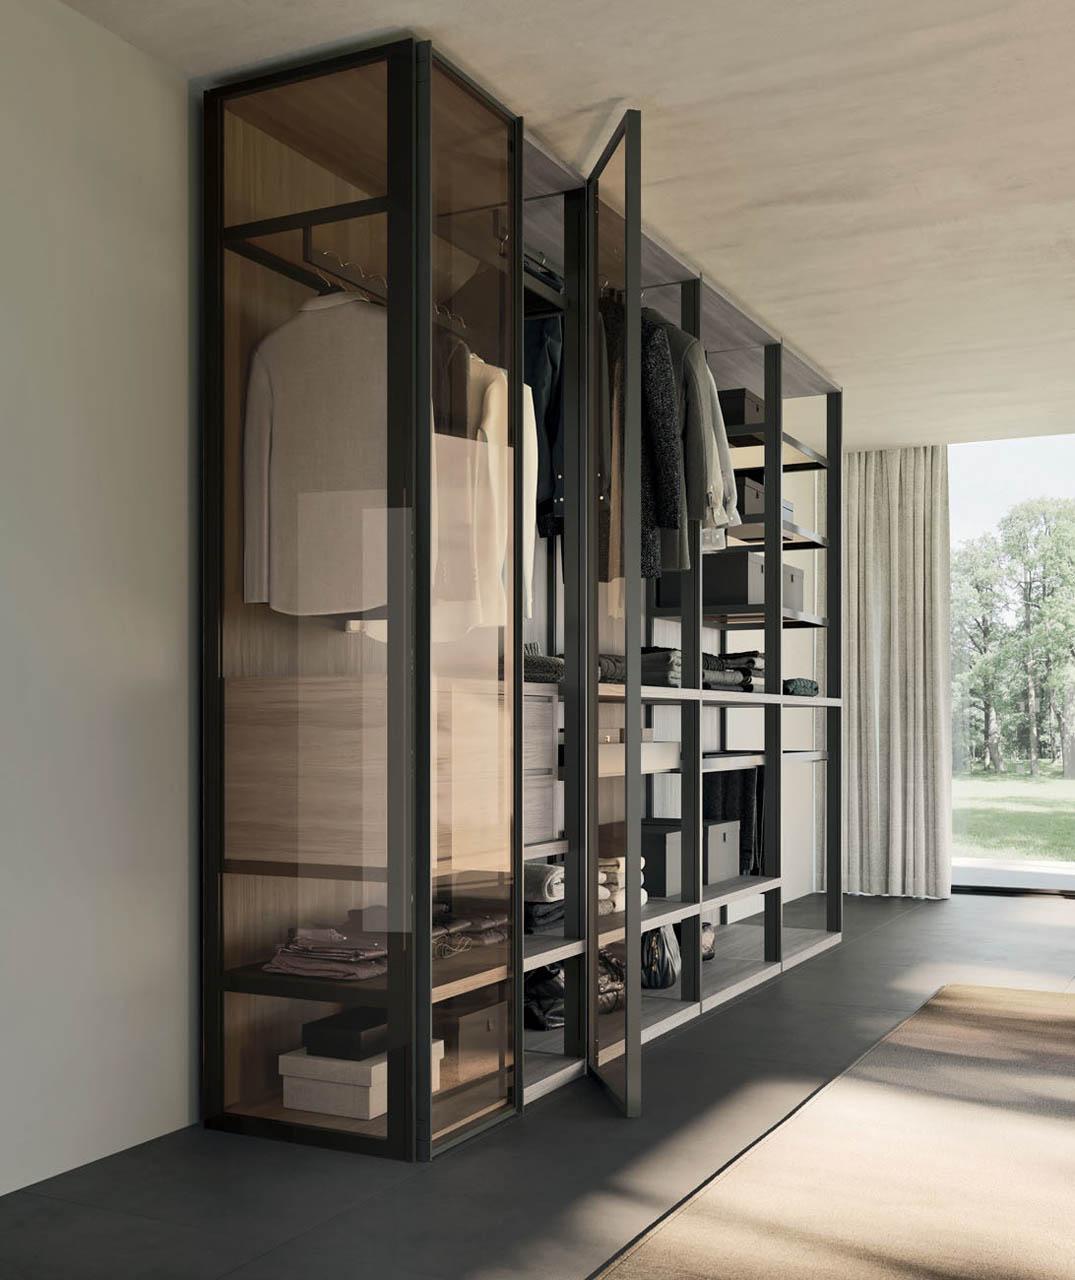 cabina-armadio-skeletro-6-orme-1092x1300